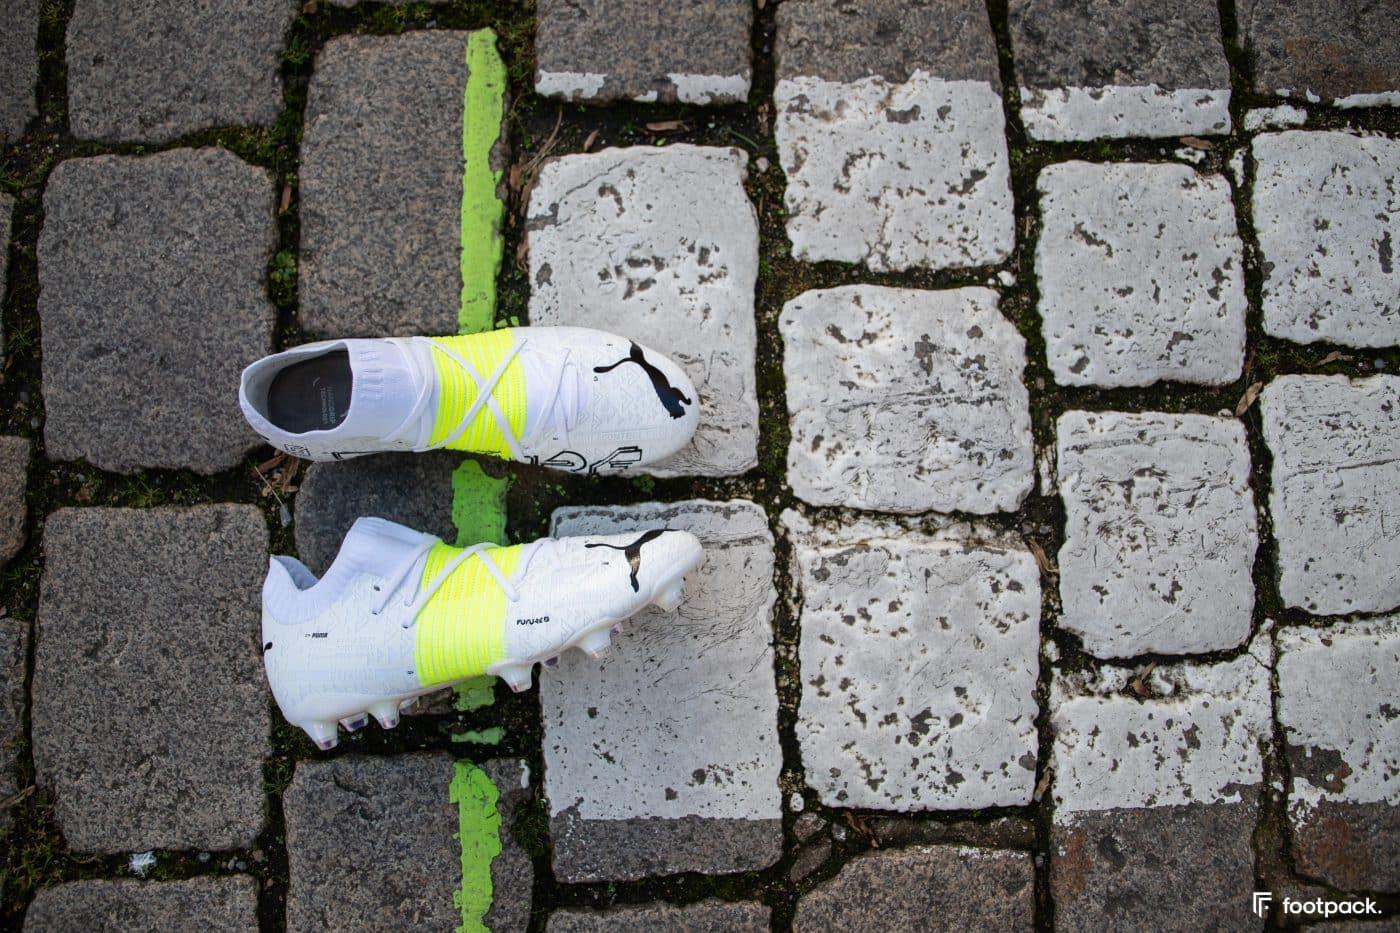 puma-future-z-teaser-edition-shooting-footpack-27